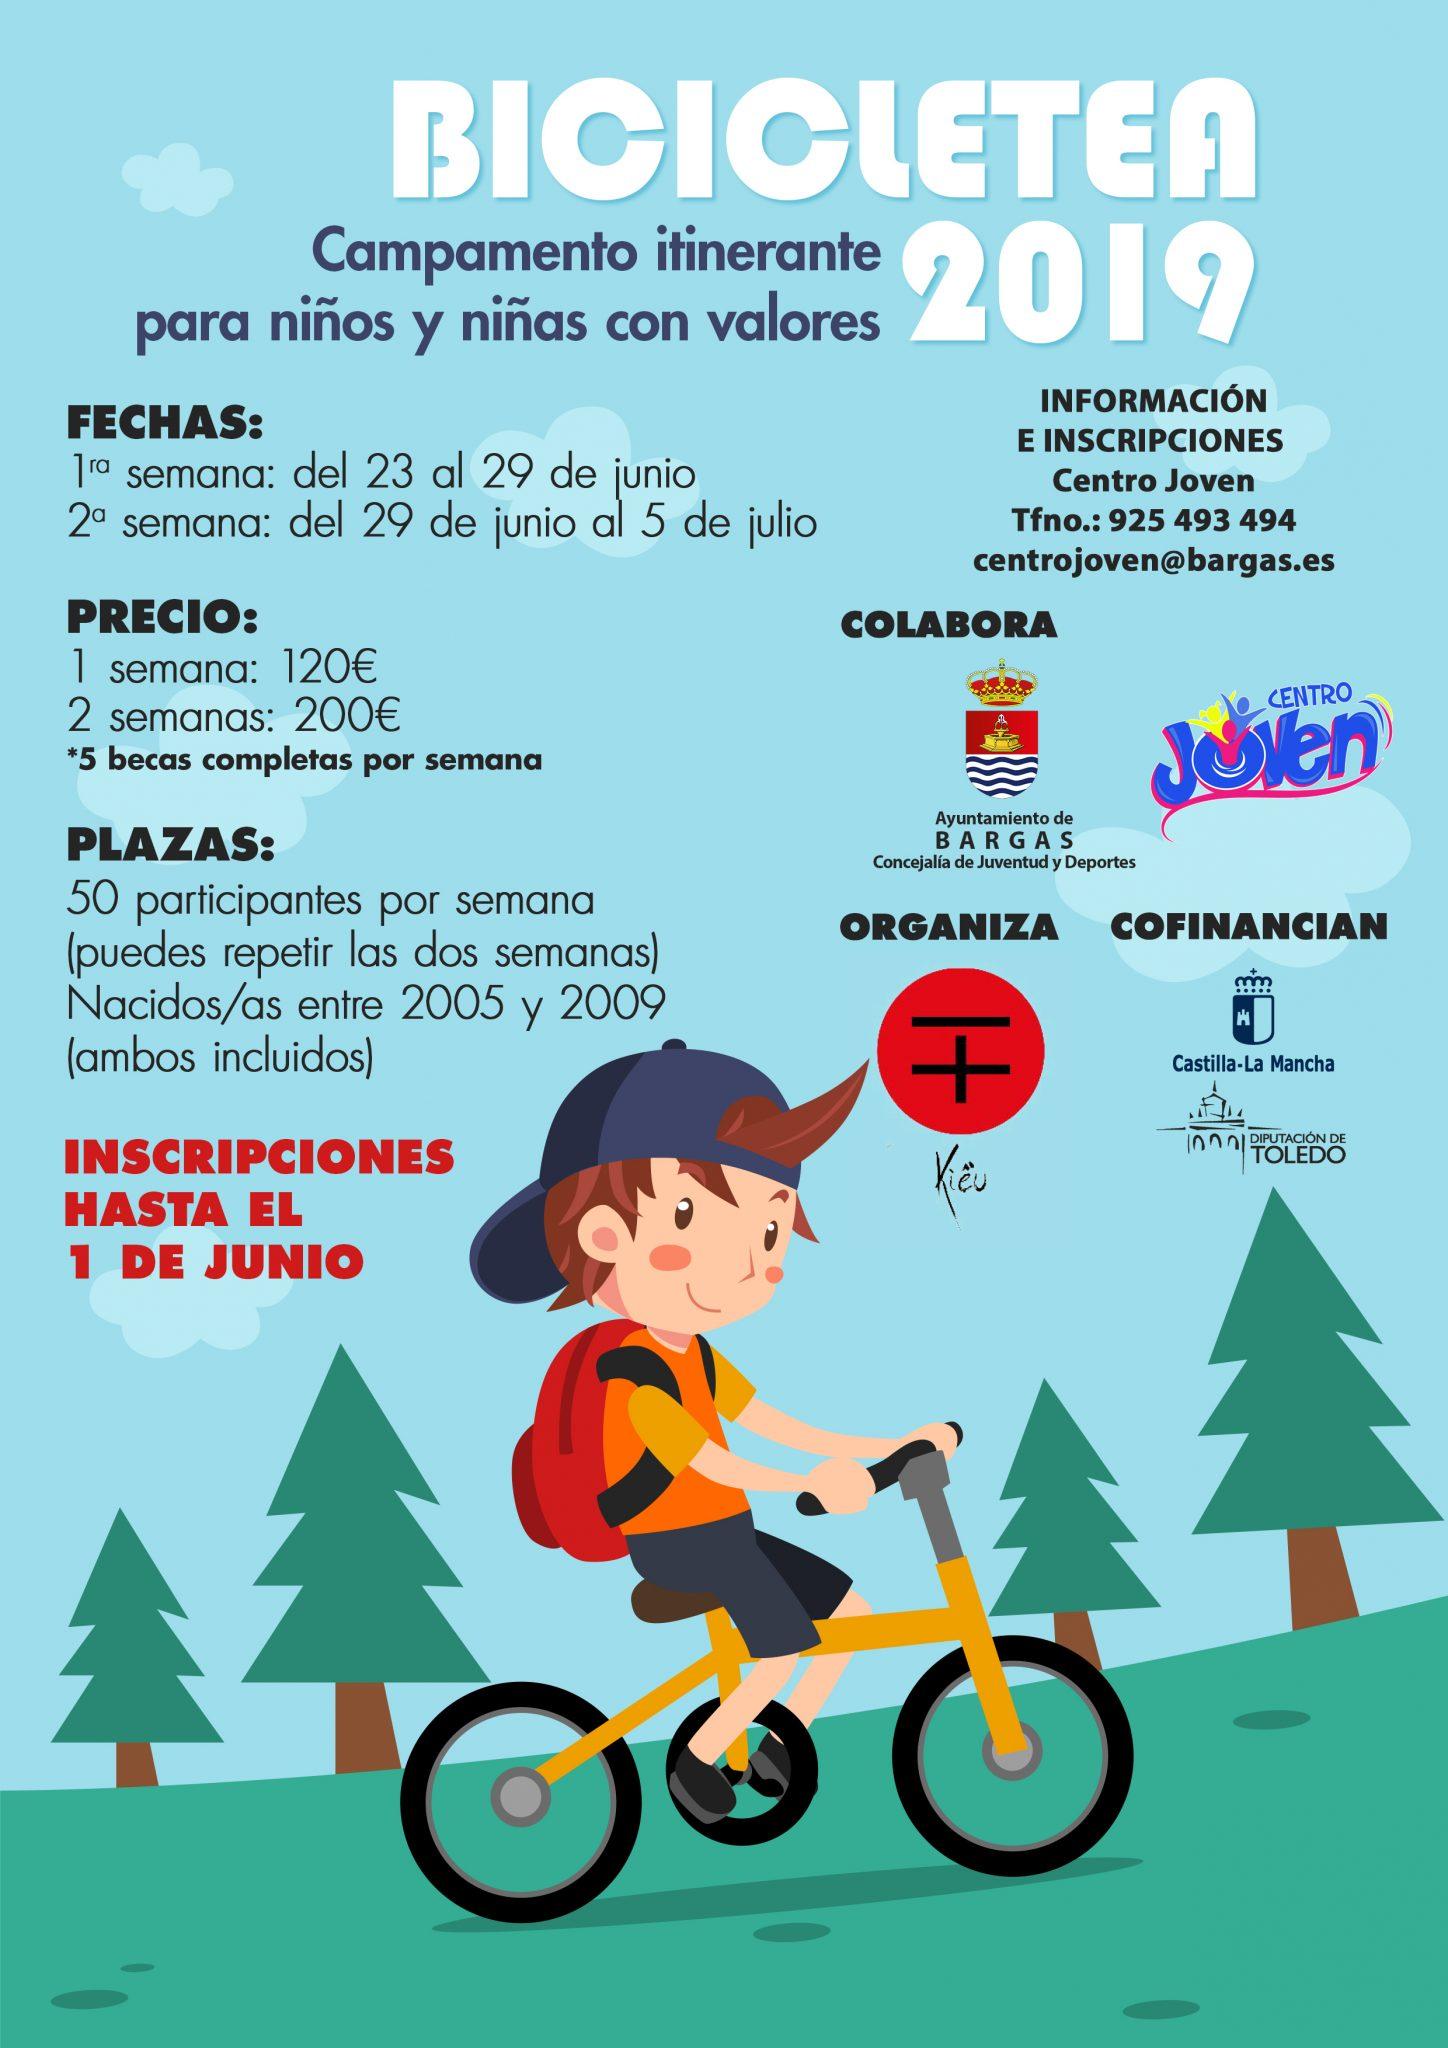 Bicicletea 2019